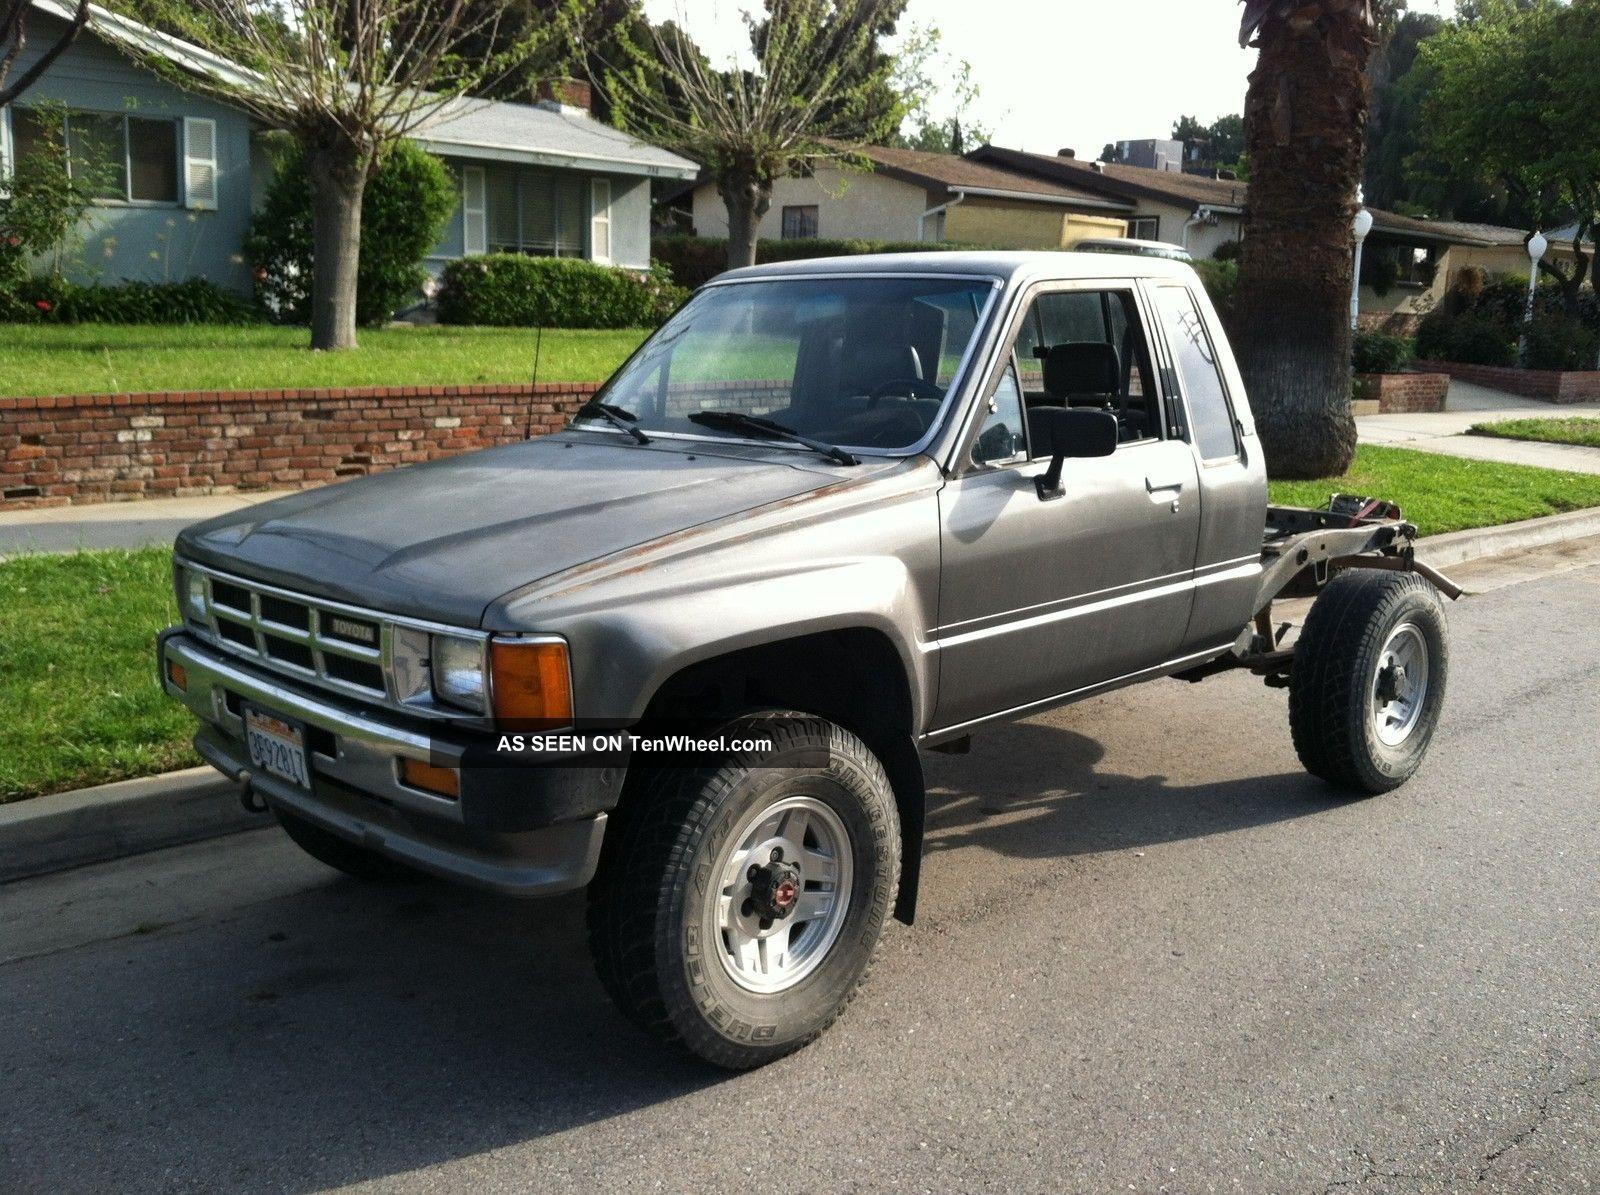 1986 Toyota 4x4 Xtracab Tacoma Truck Ac 4 Cyl 5 Spd Sr5 Rebuilt Motor W / Receipt Tacoma photo